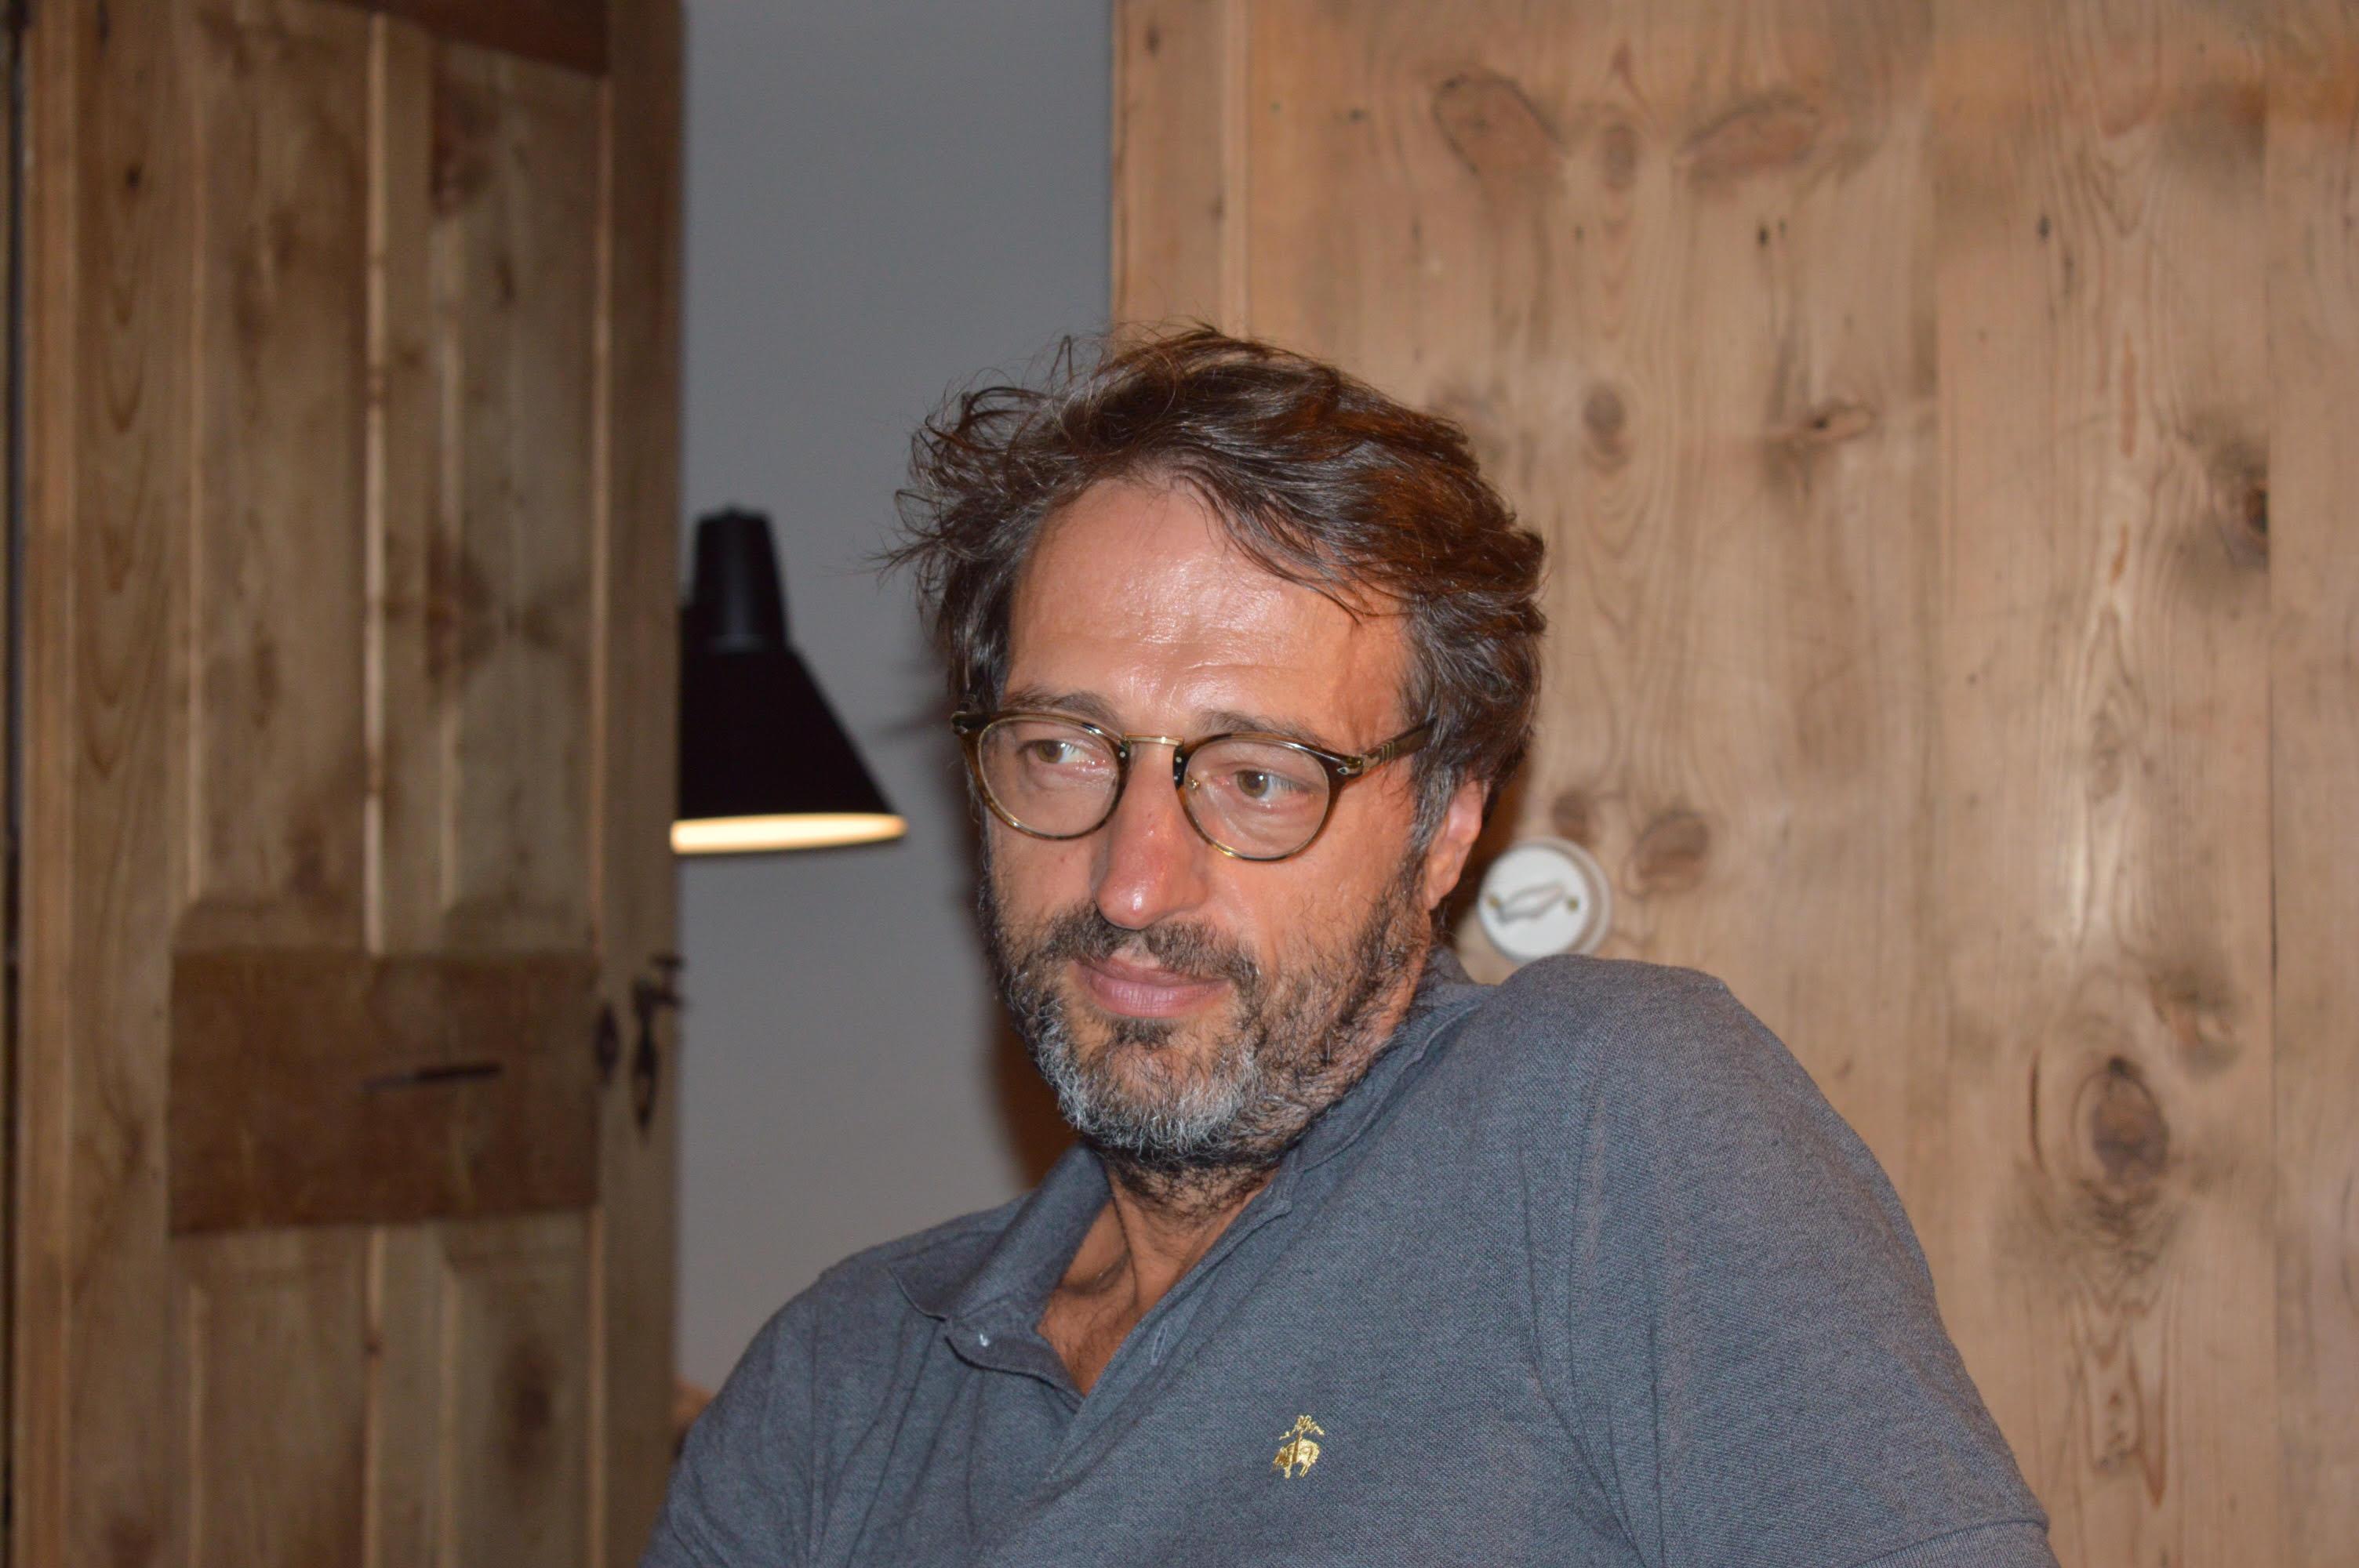 Antonio Selvatici